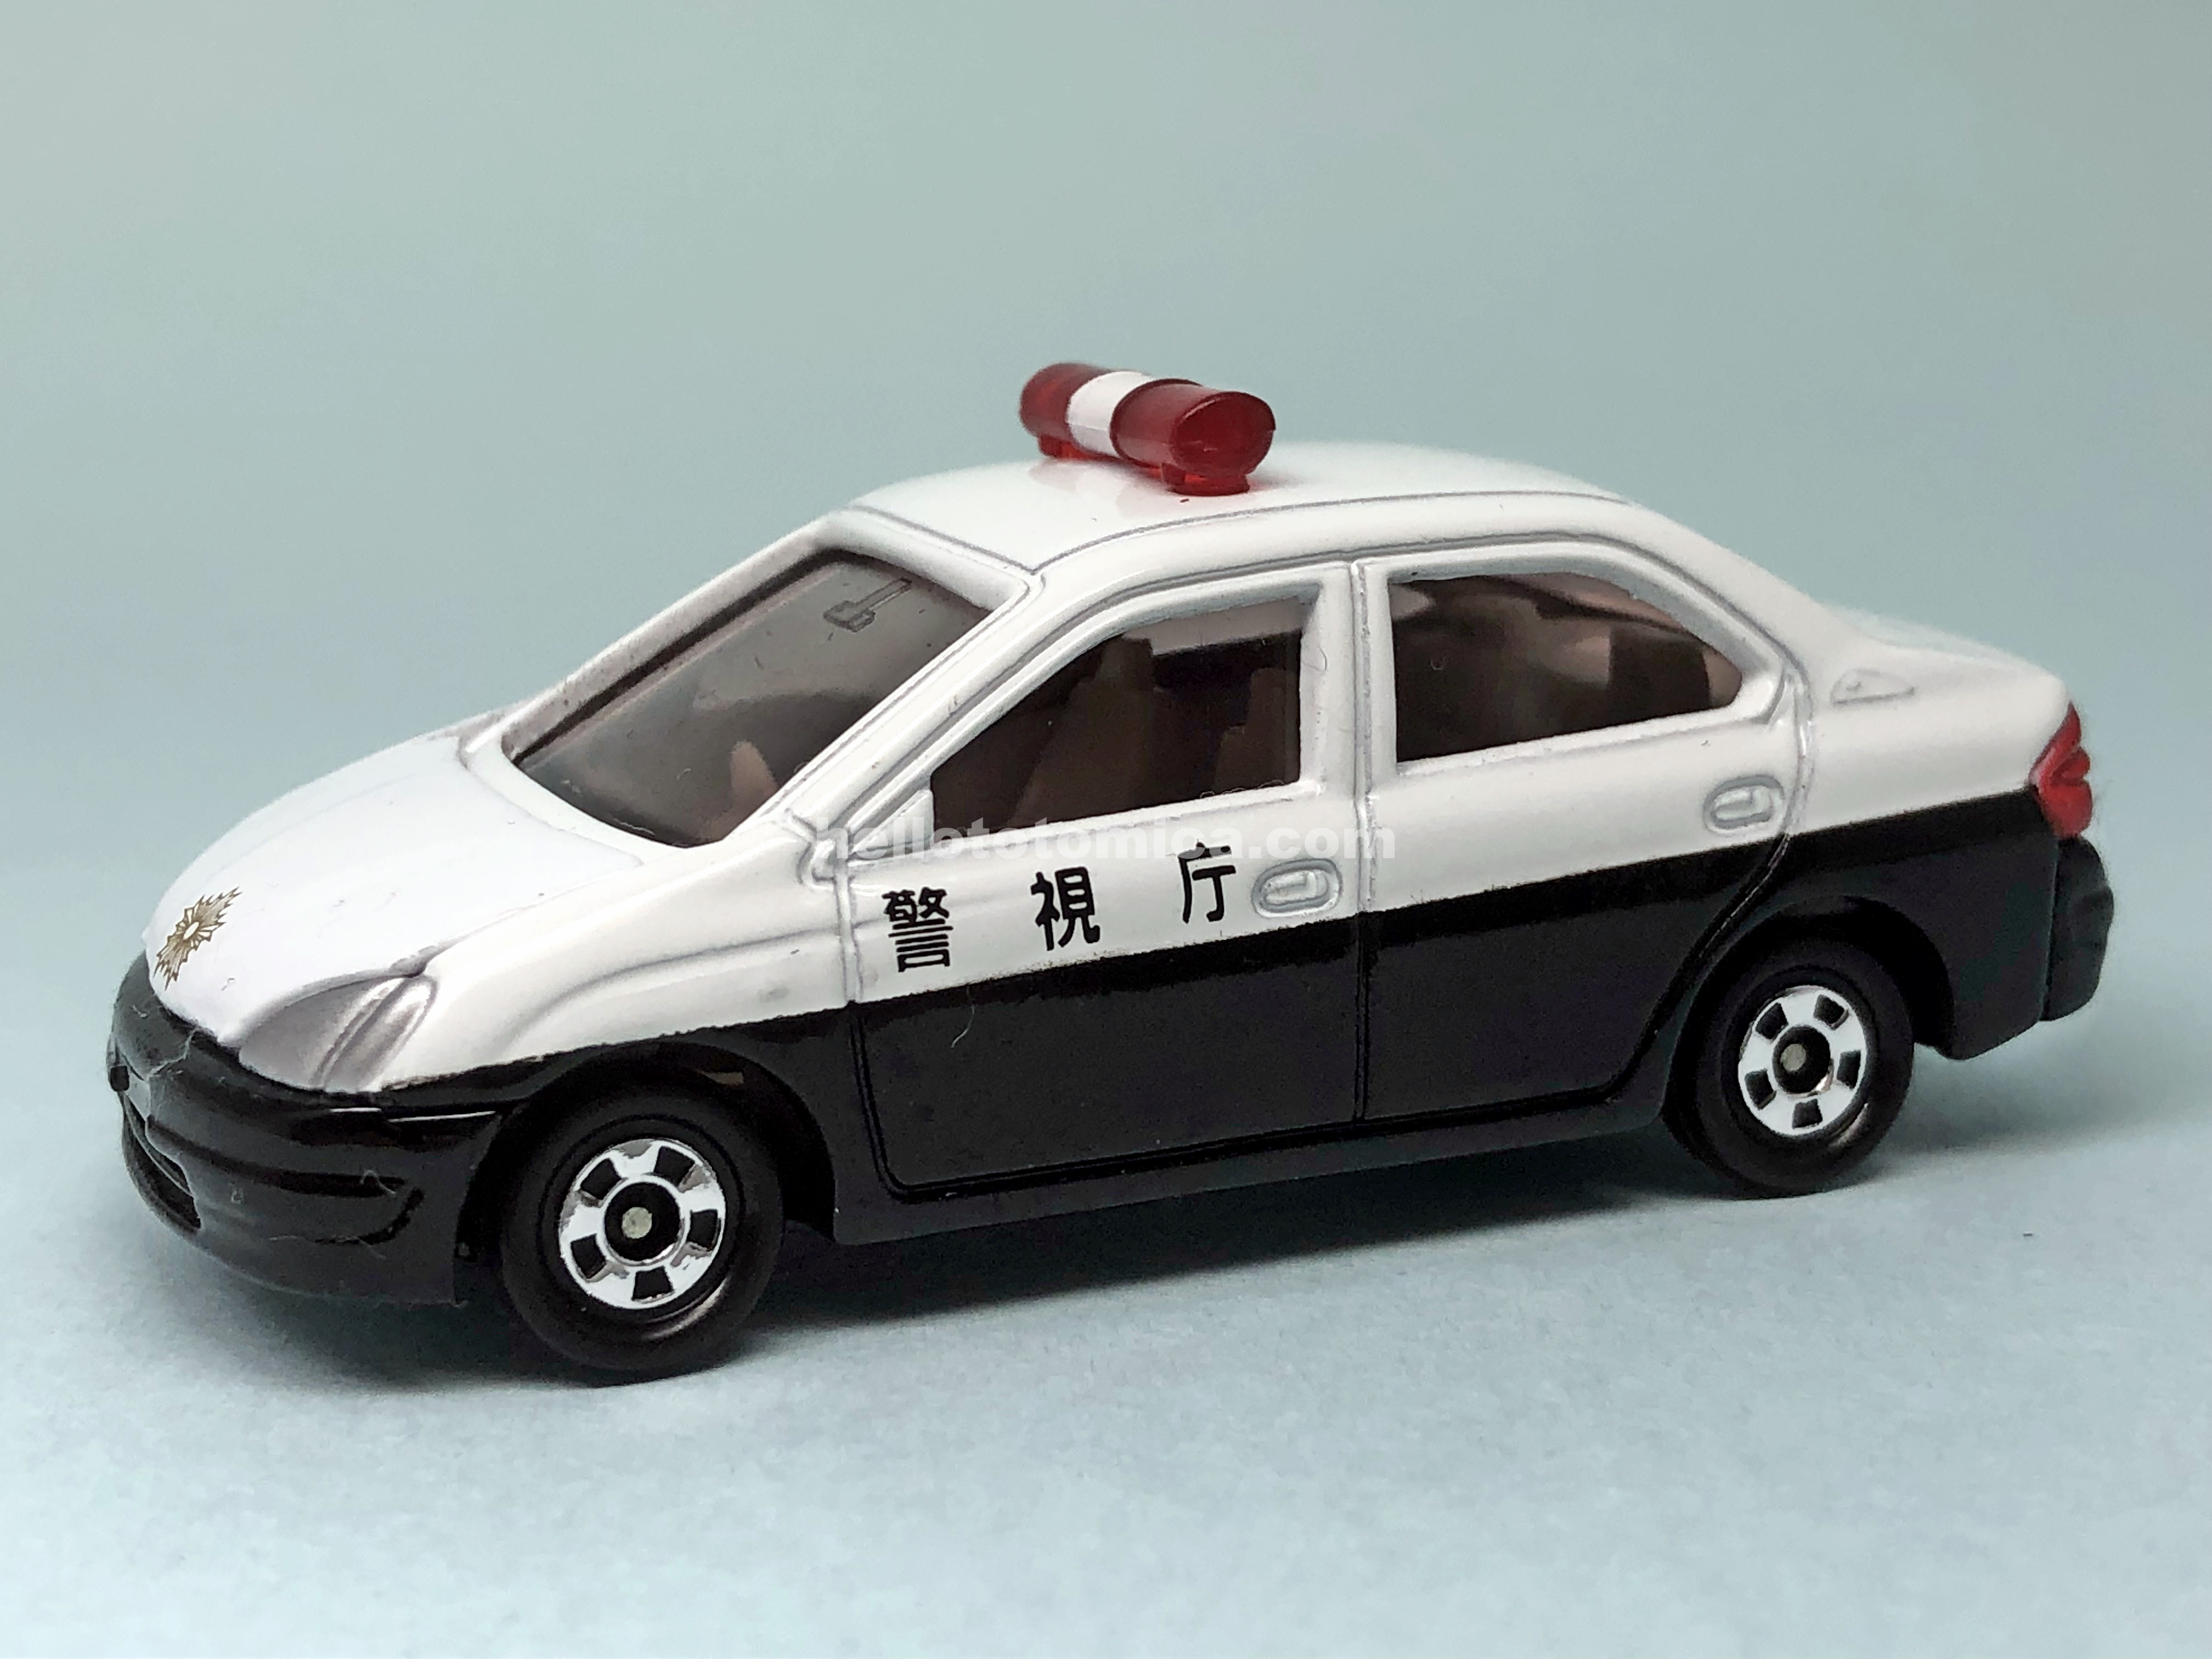 86-3 TOYOTA PRIUS PATROL CAR